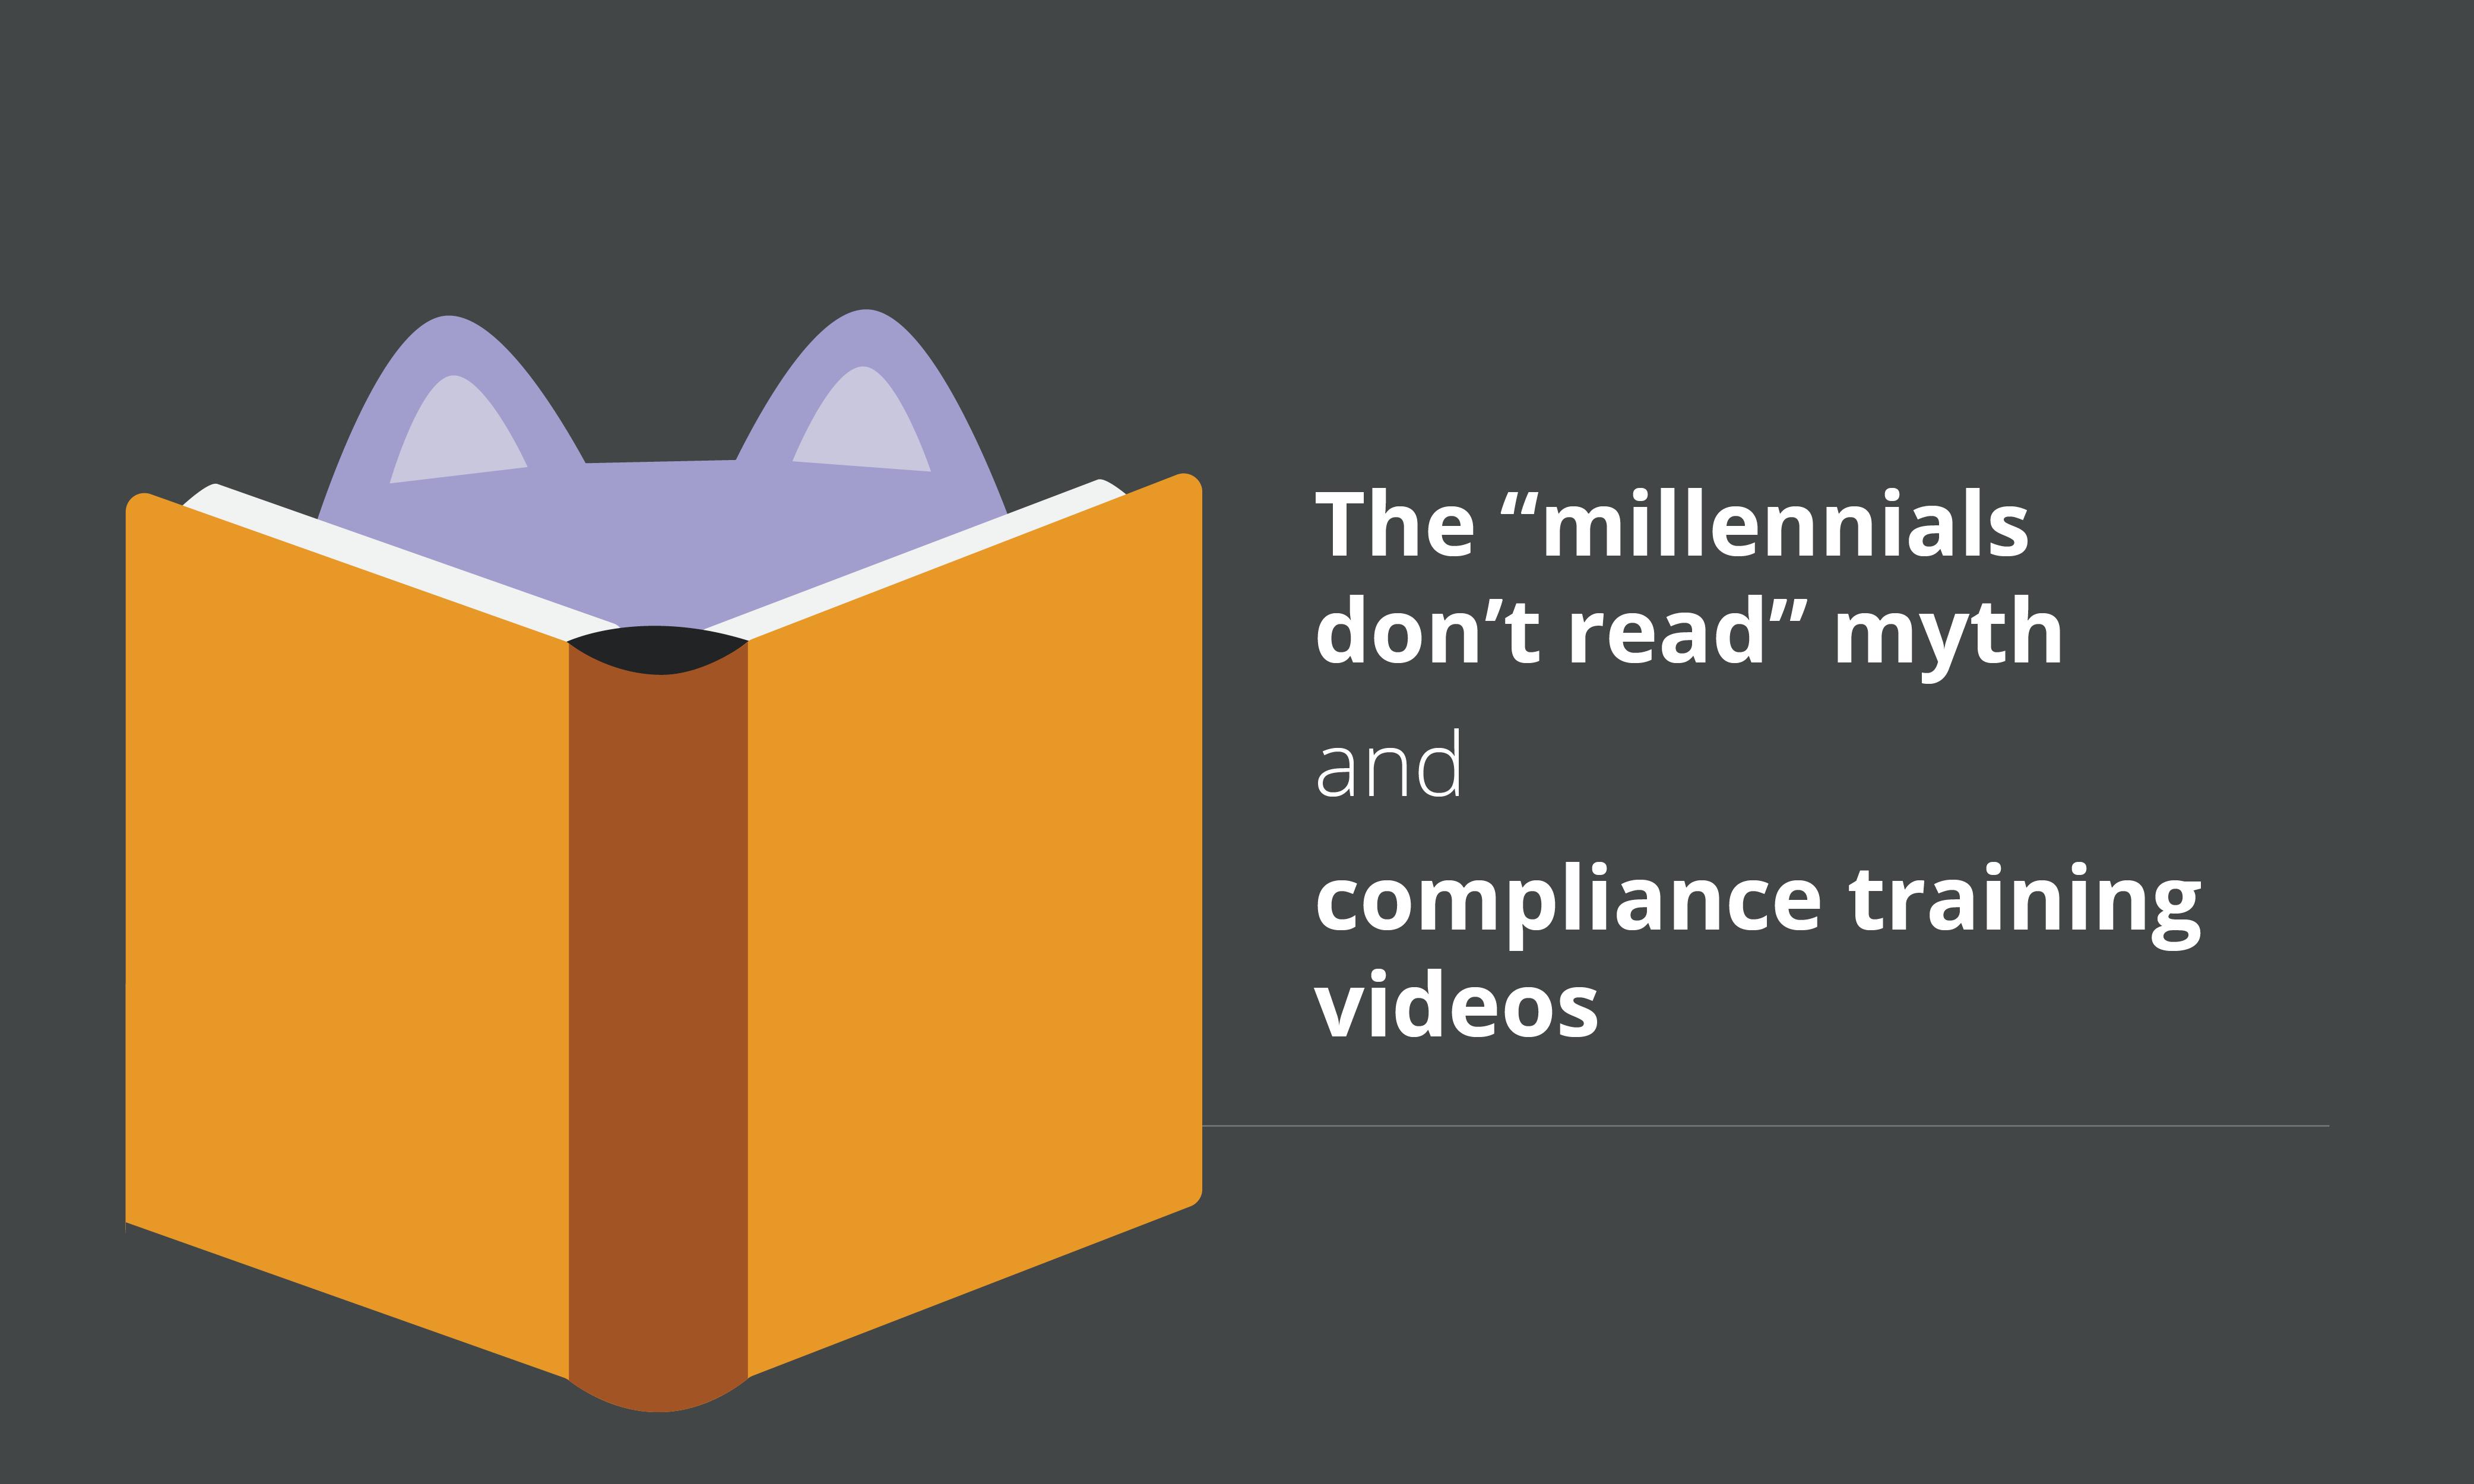 millennials dont read myth blog